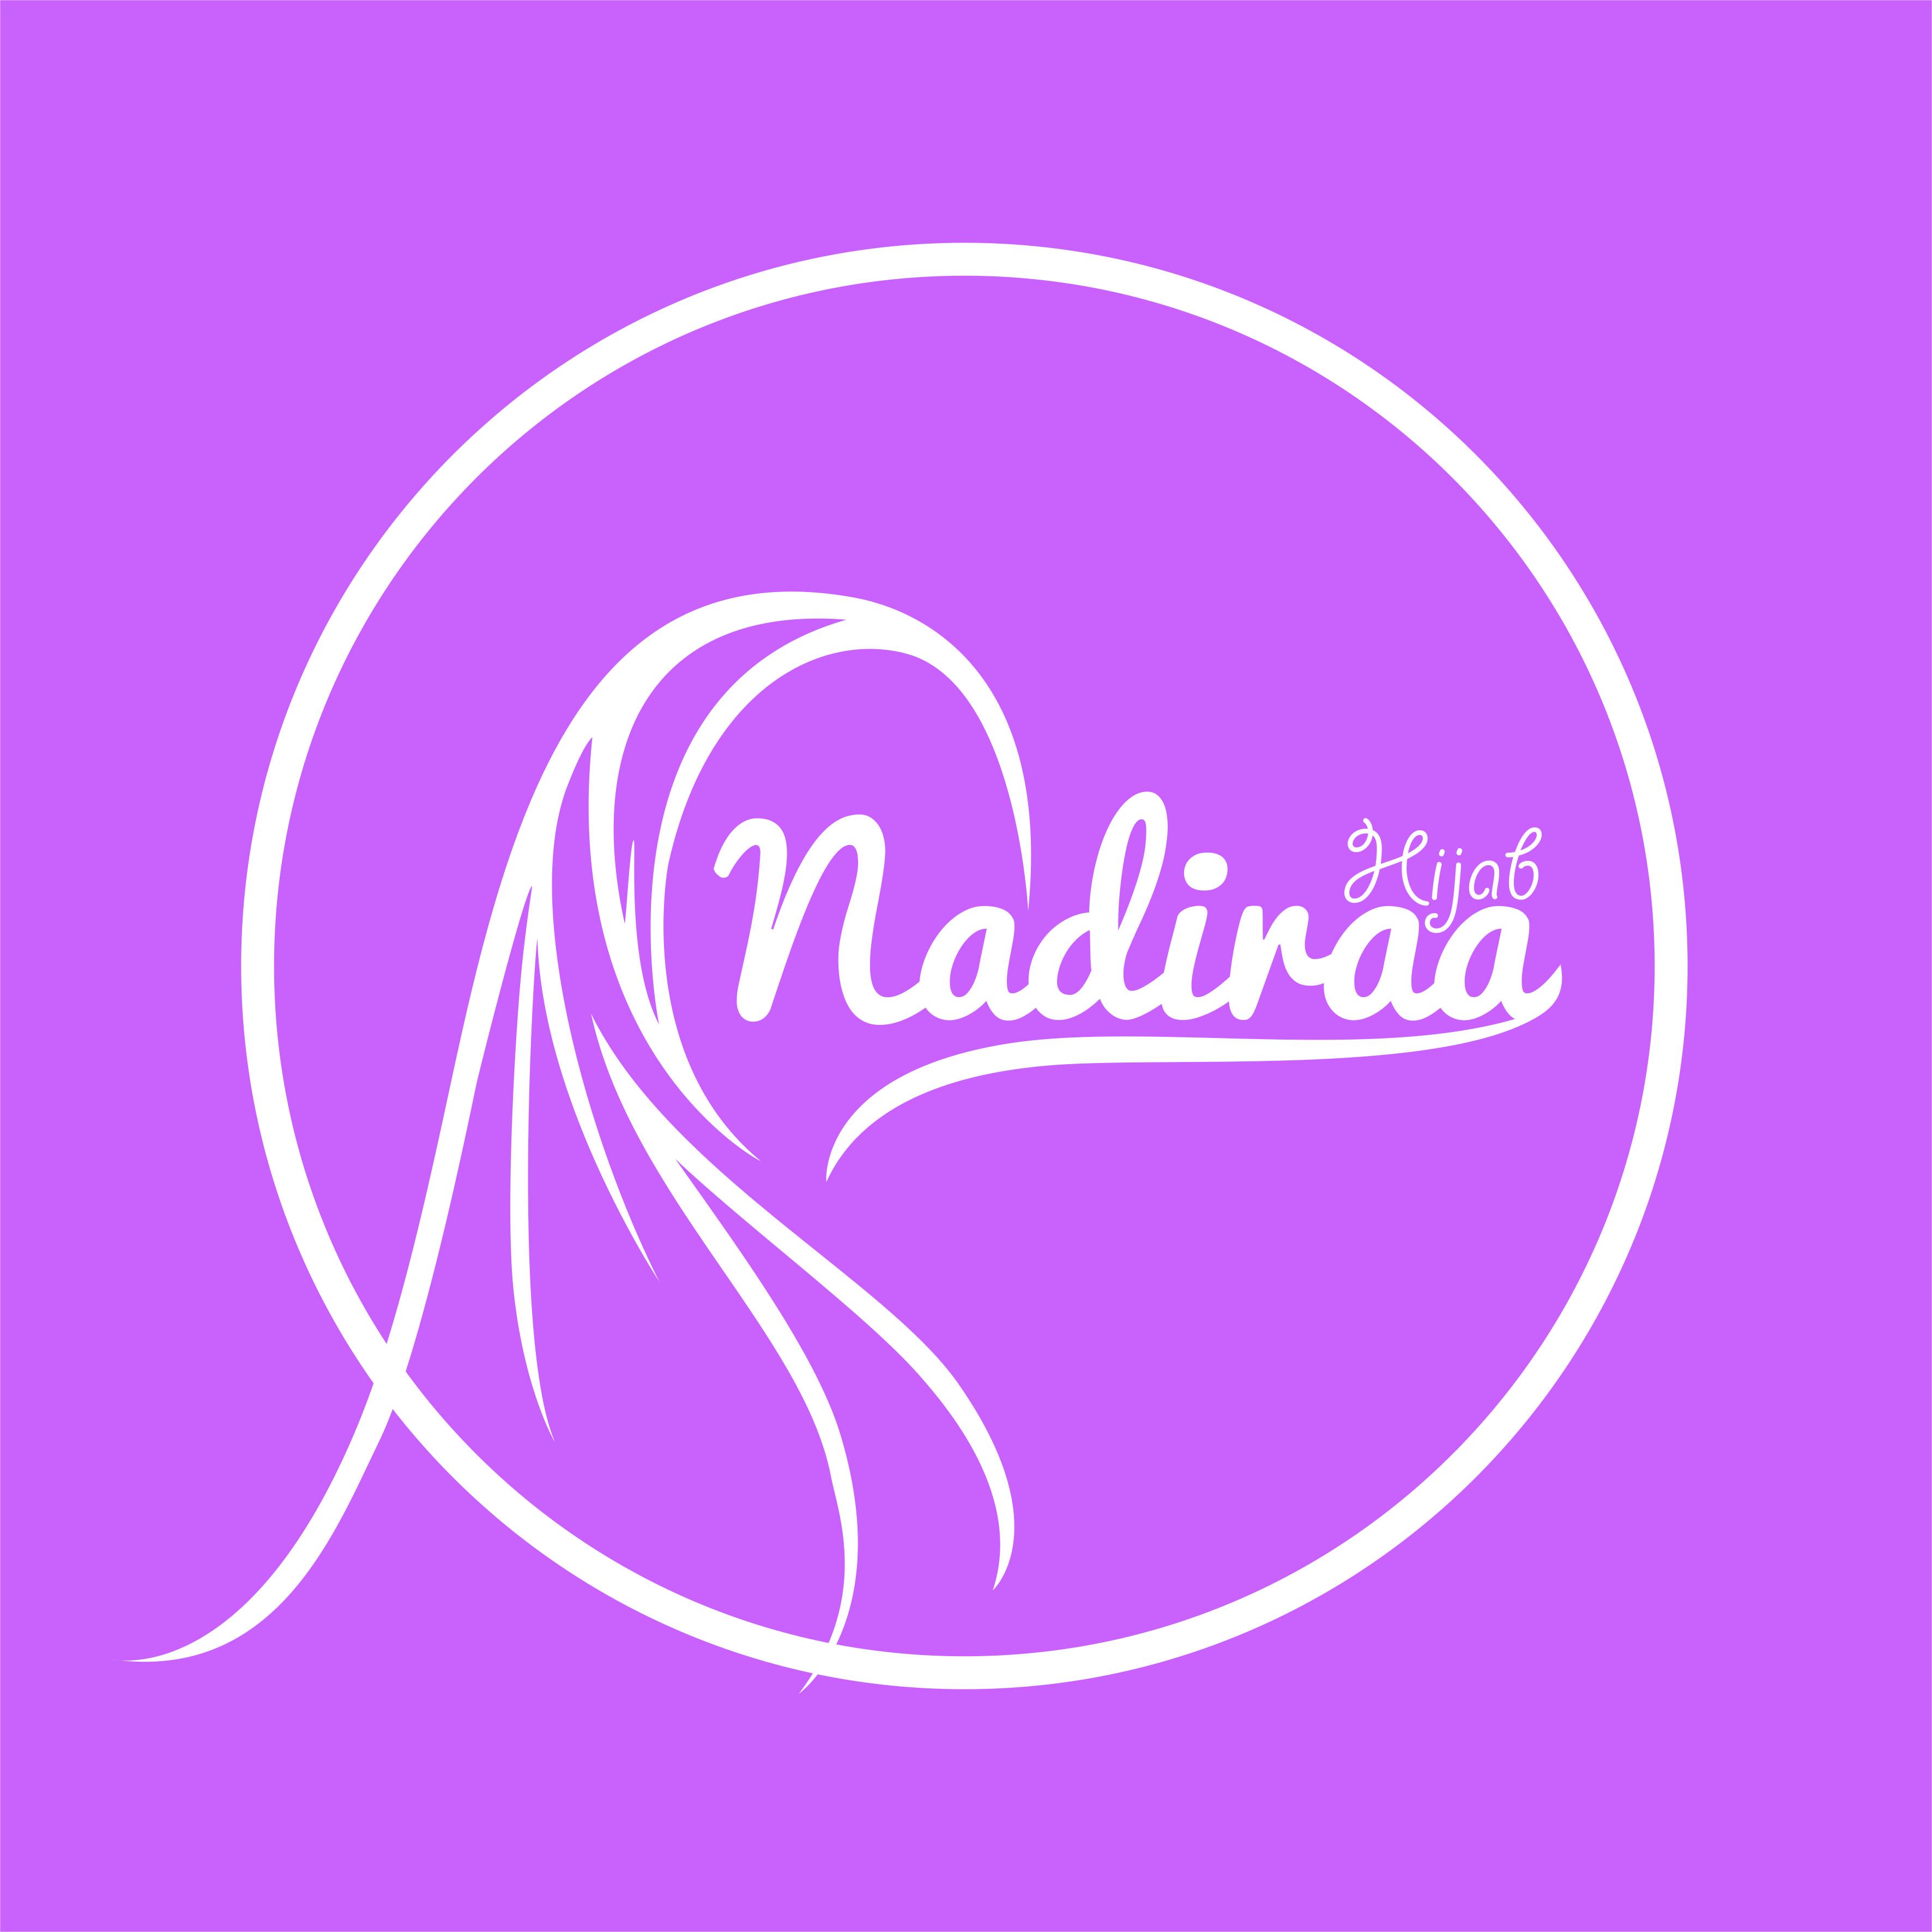 Nadiraa Hijab Logo Artwork By: Yogatama Yalesena  Desain logo